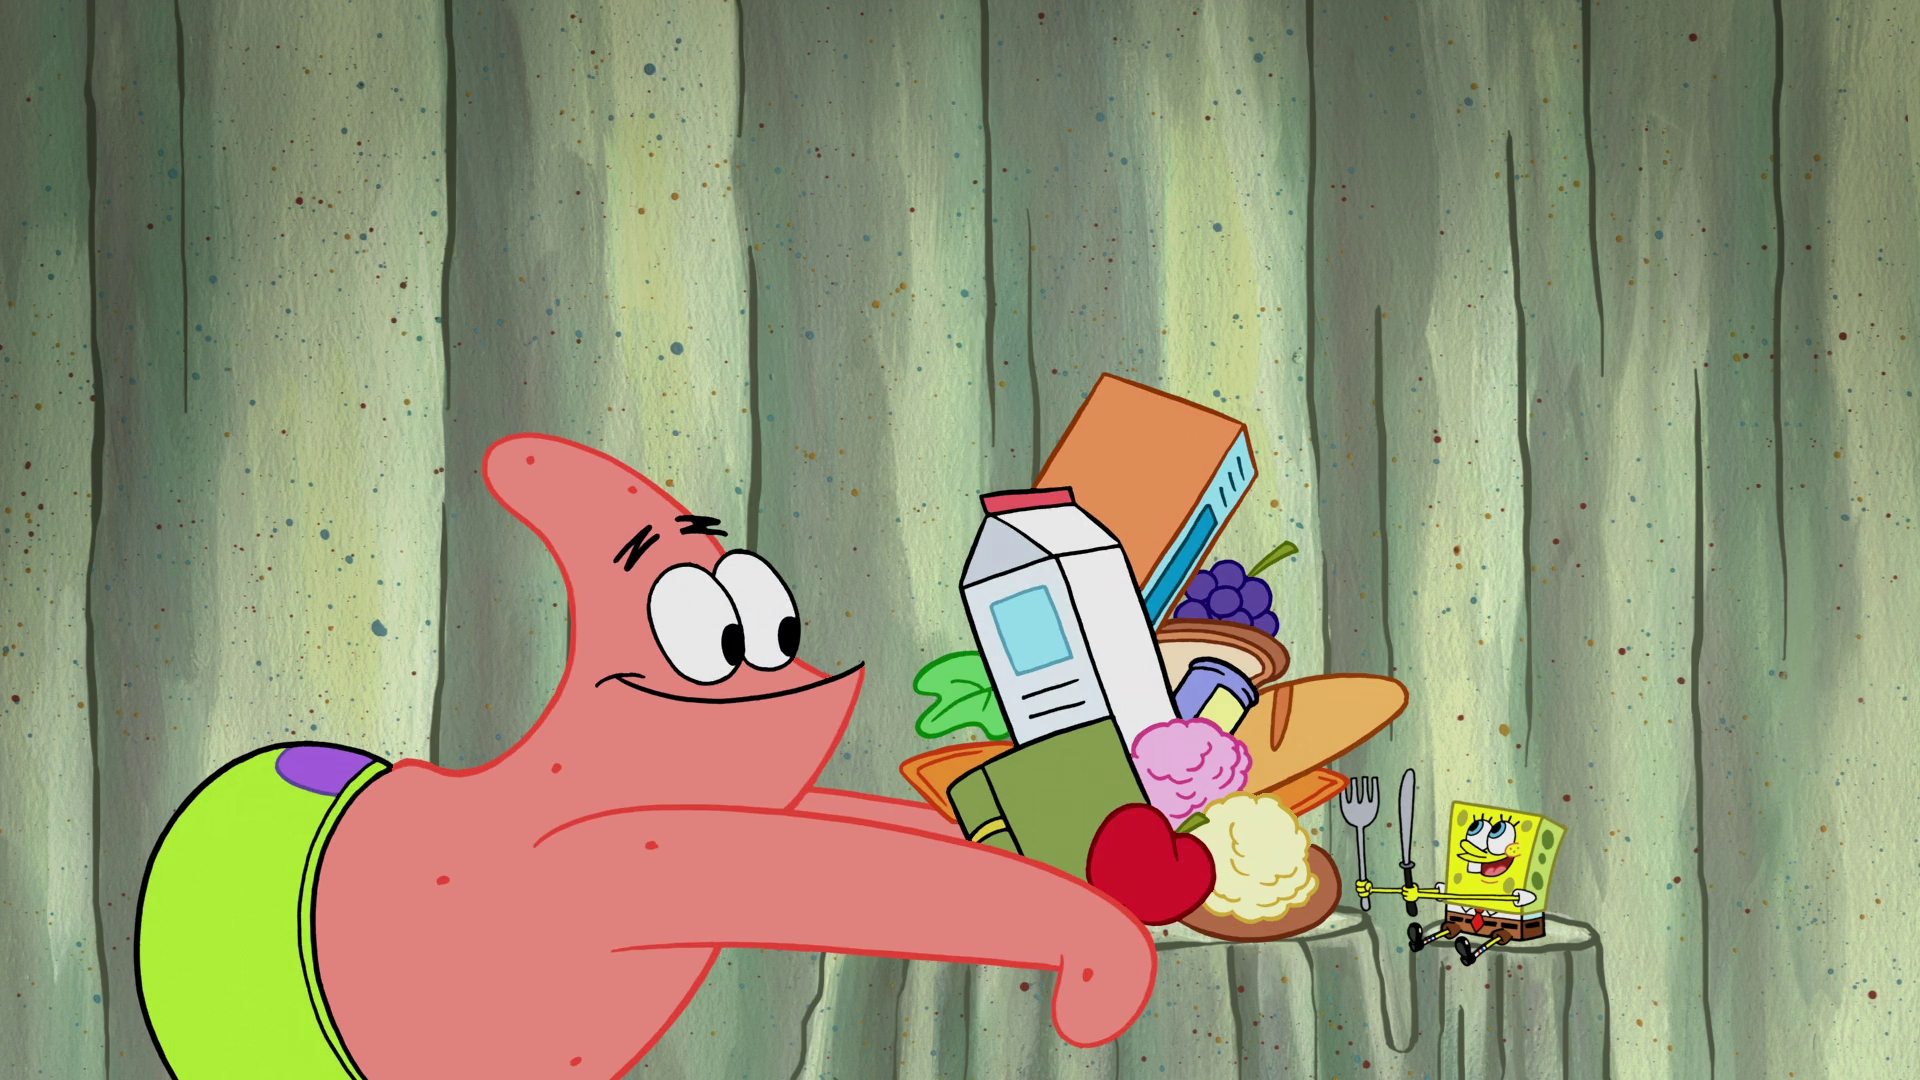 image - fun-sized friends 084 | encyclopedia spongebobia